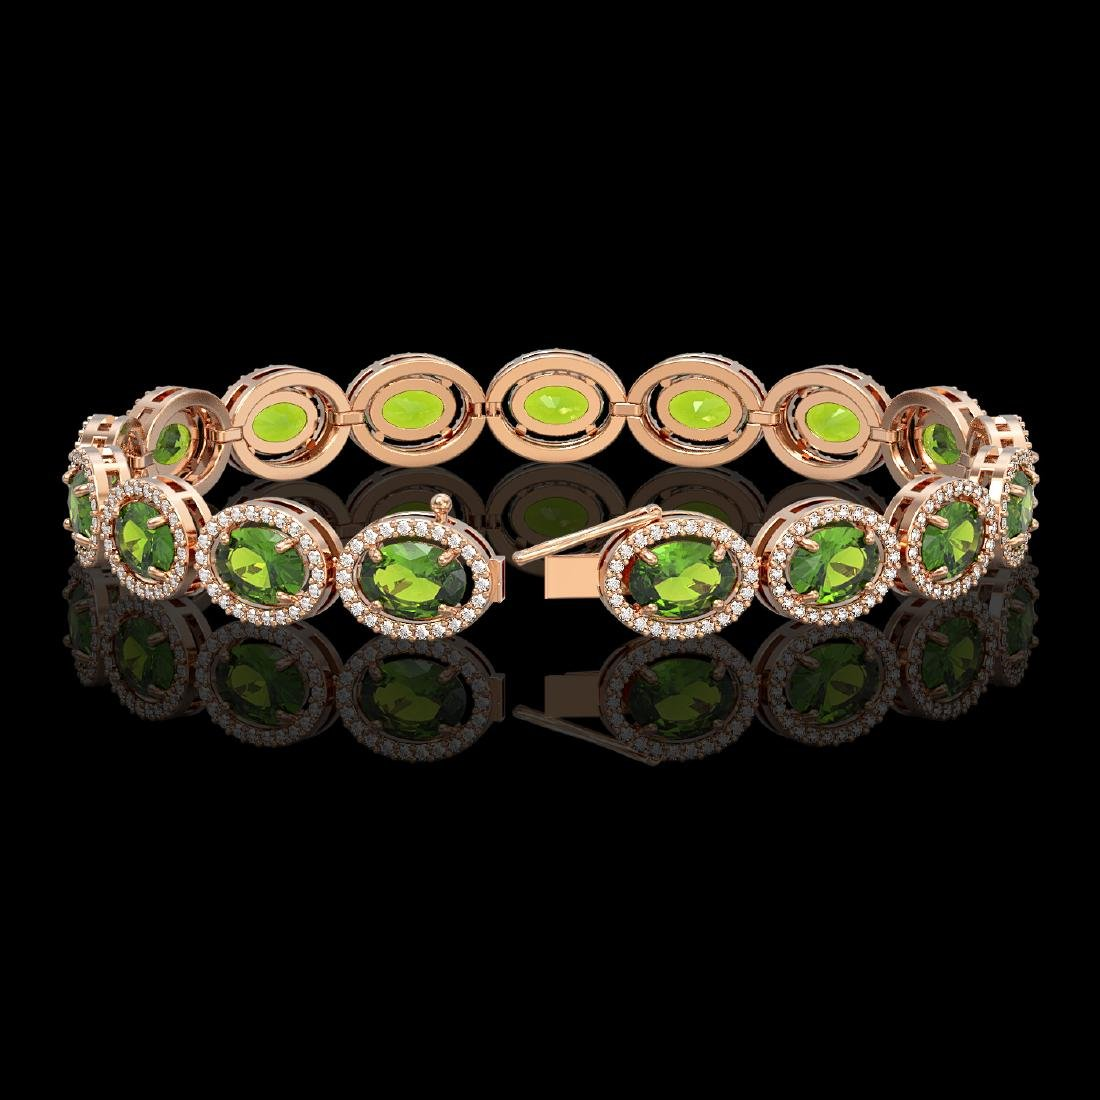 21.13 CTW Peridot & Diamond Halo Bracelet 10K Rose Gold - 2